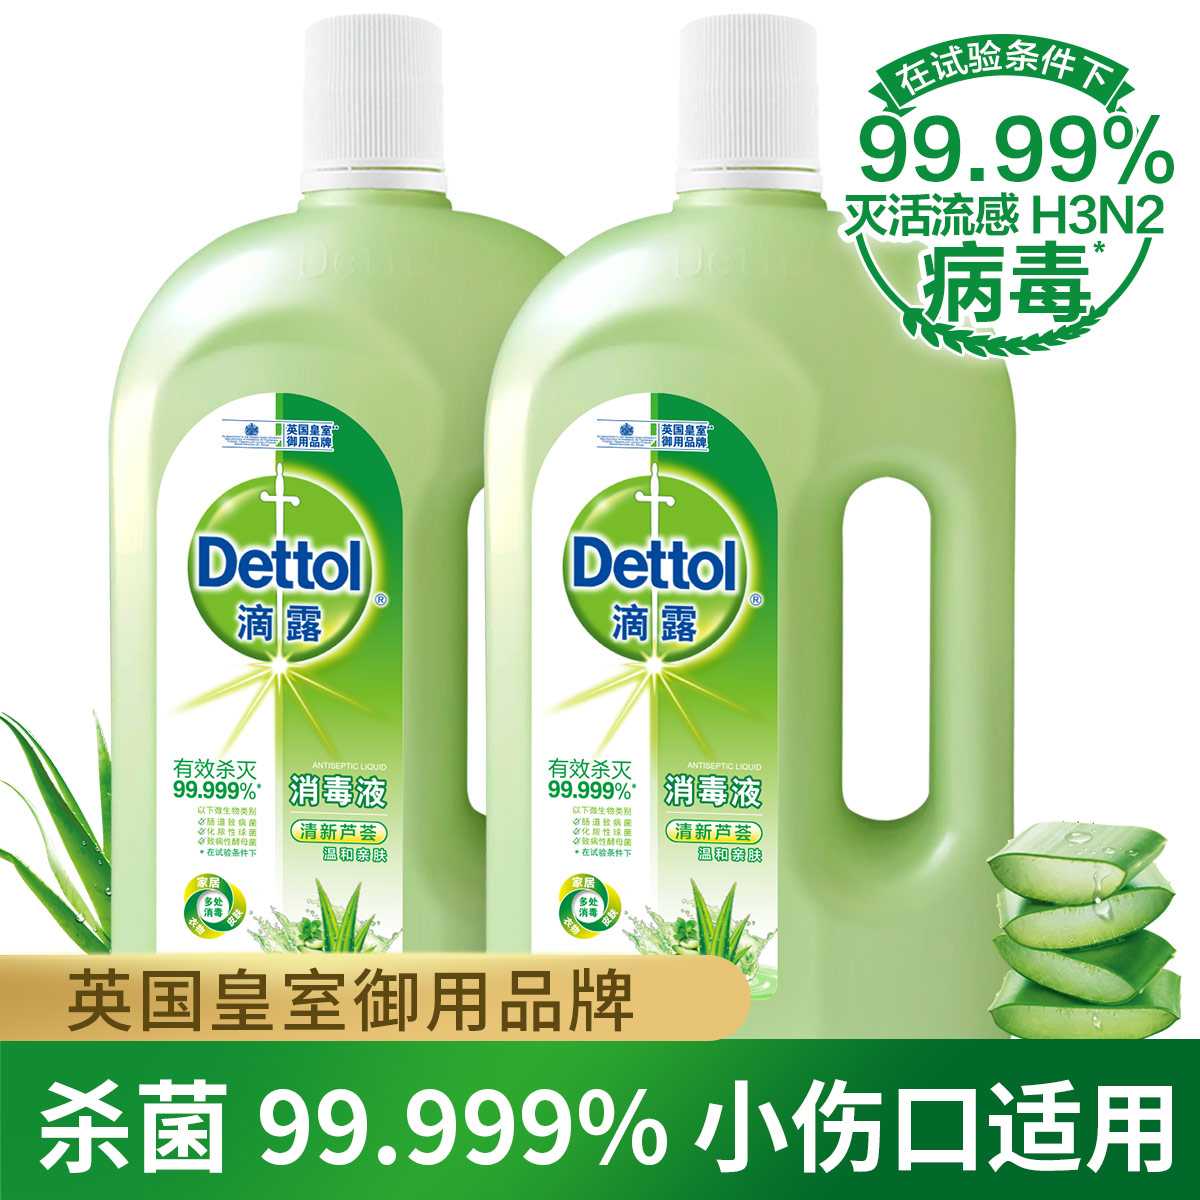 Dettol 【杀菌99.999%】滴露芦荟消毒液1L*2 高效除螨 温和亲肤 家用消毒